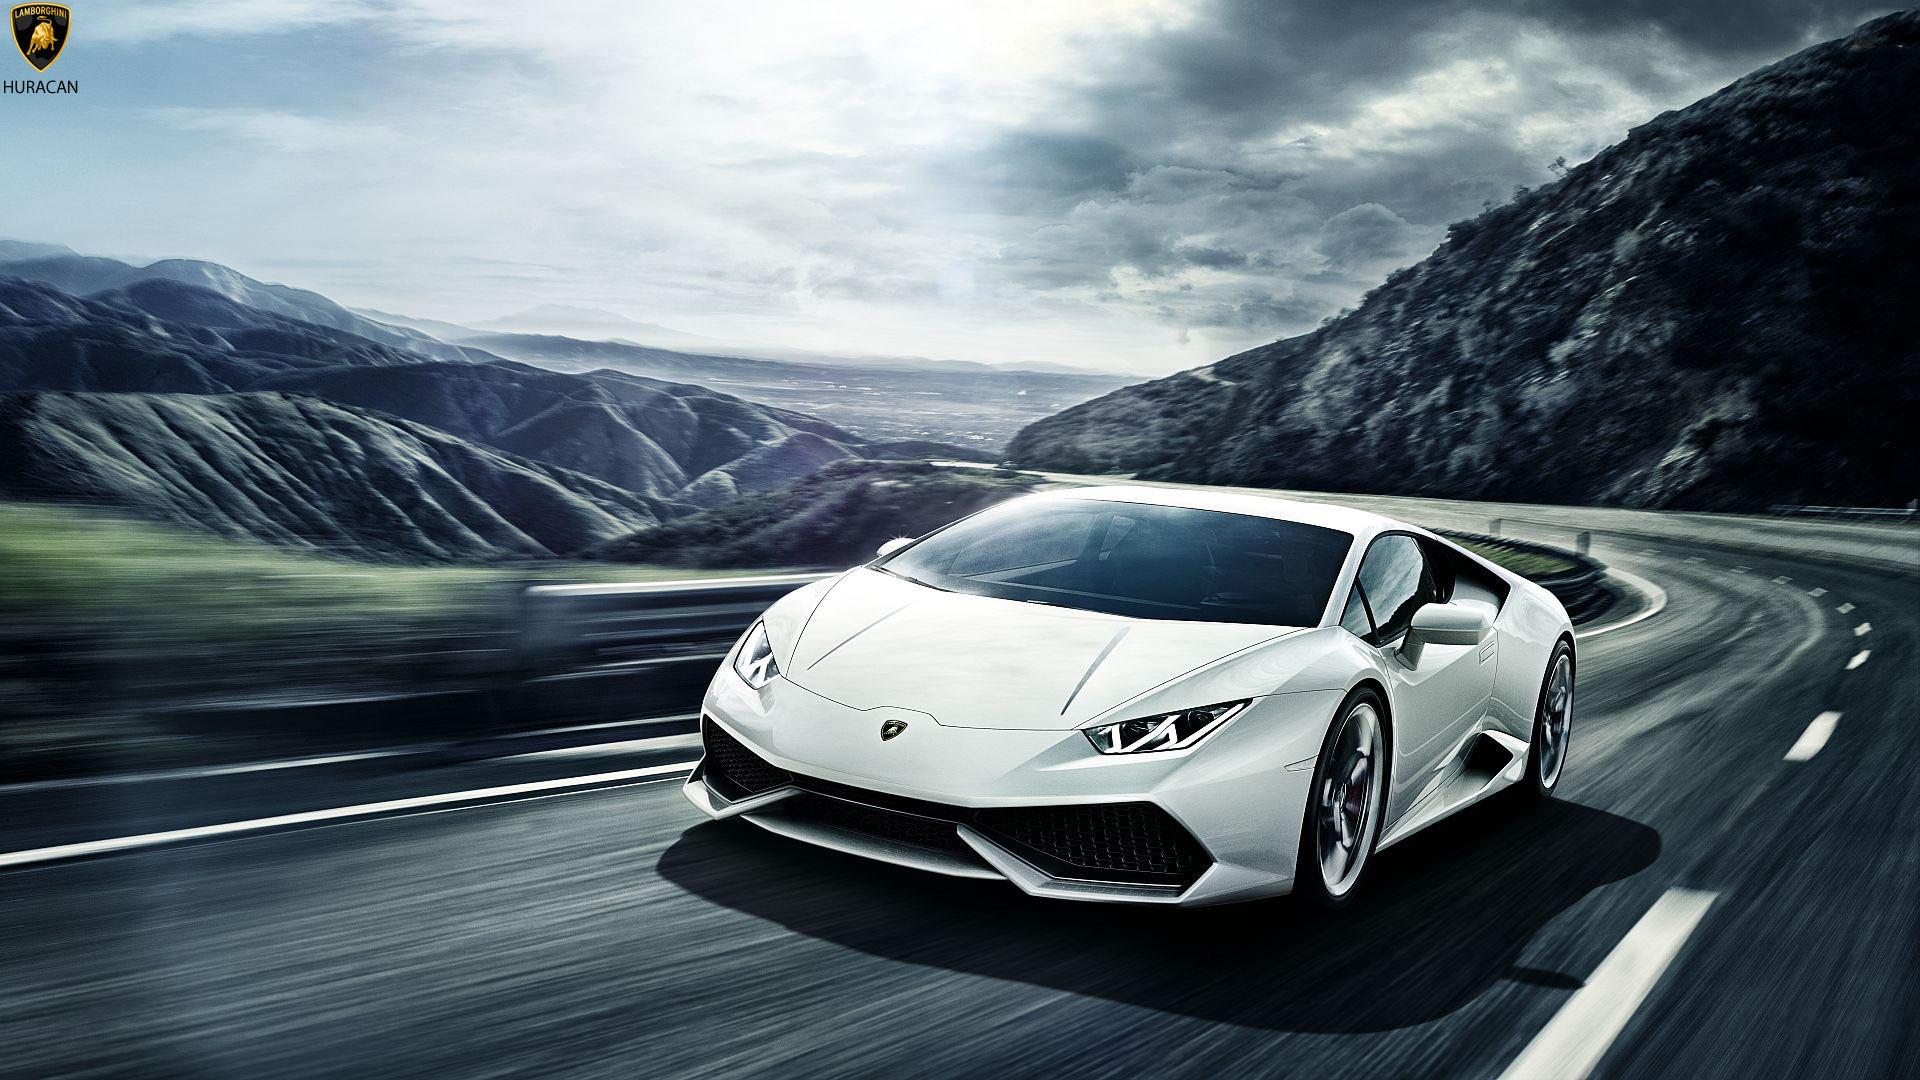 1920x1080 White Latest Lamborghini Huracan Wallpaper Hd